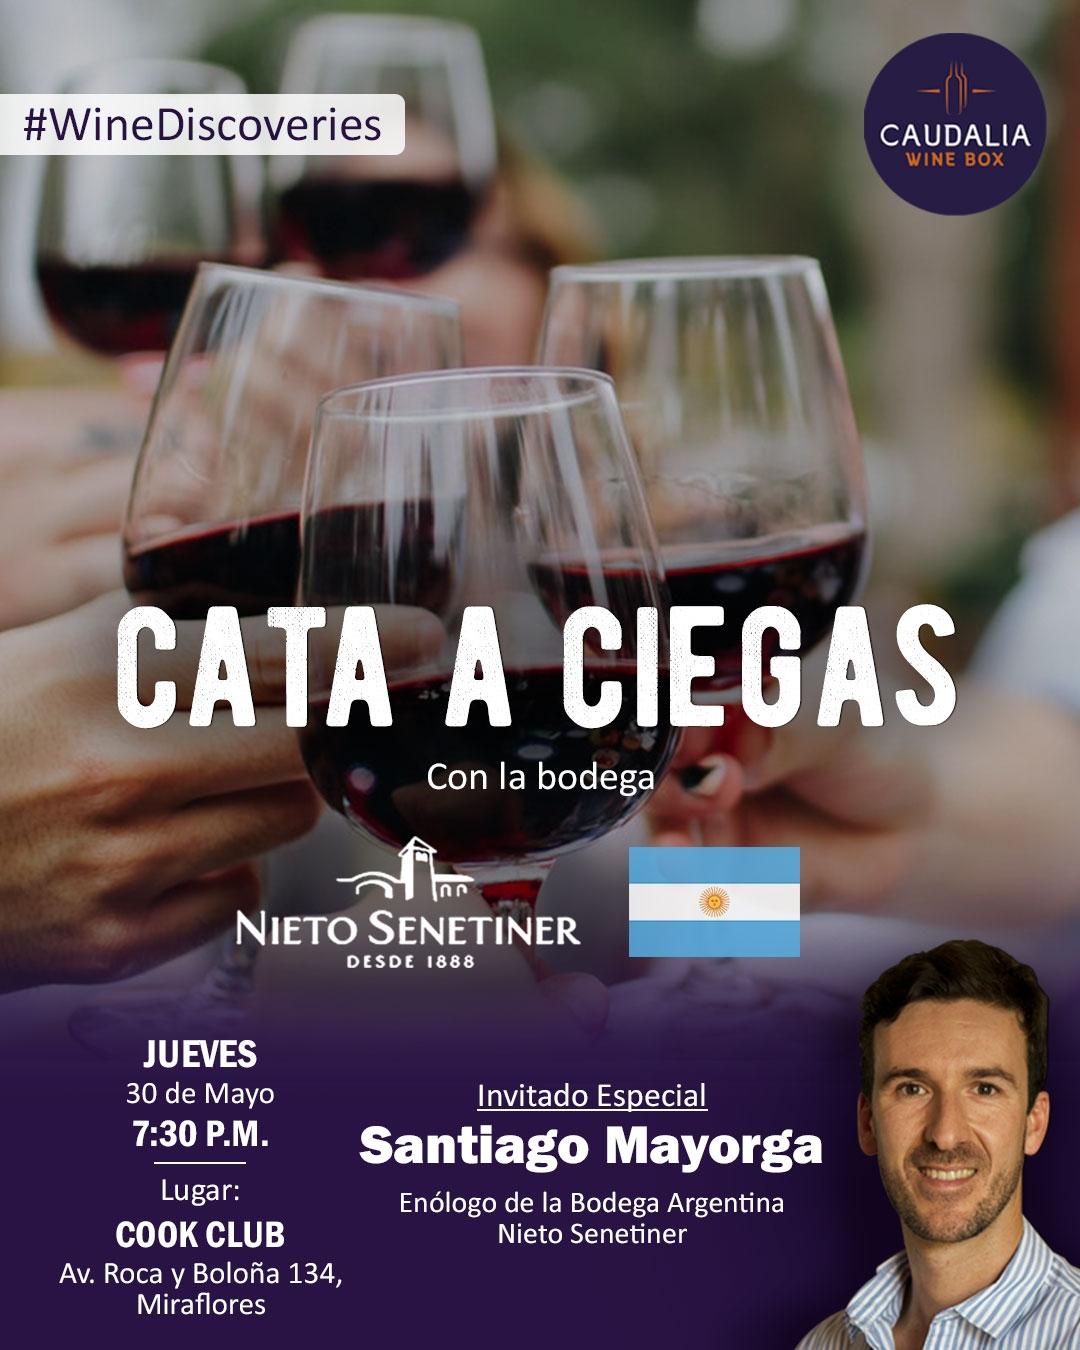 Caudalia Wine Discoveries mayo 2019 Bodega Nieto Senetiner